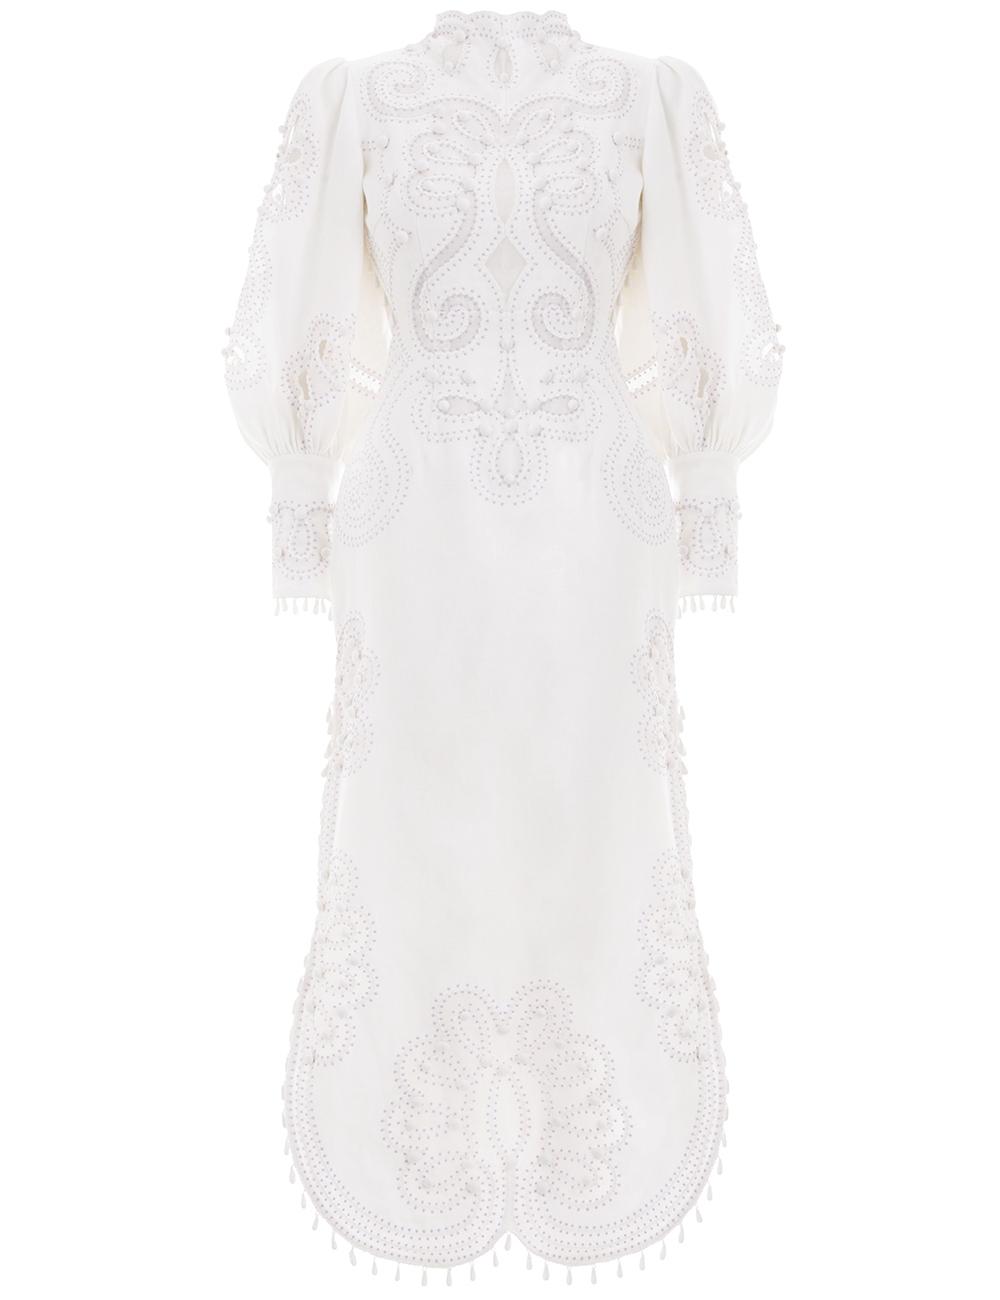 Ninety-Six Ric Rac Dress